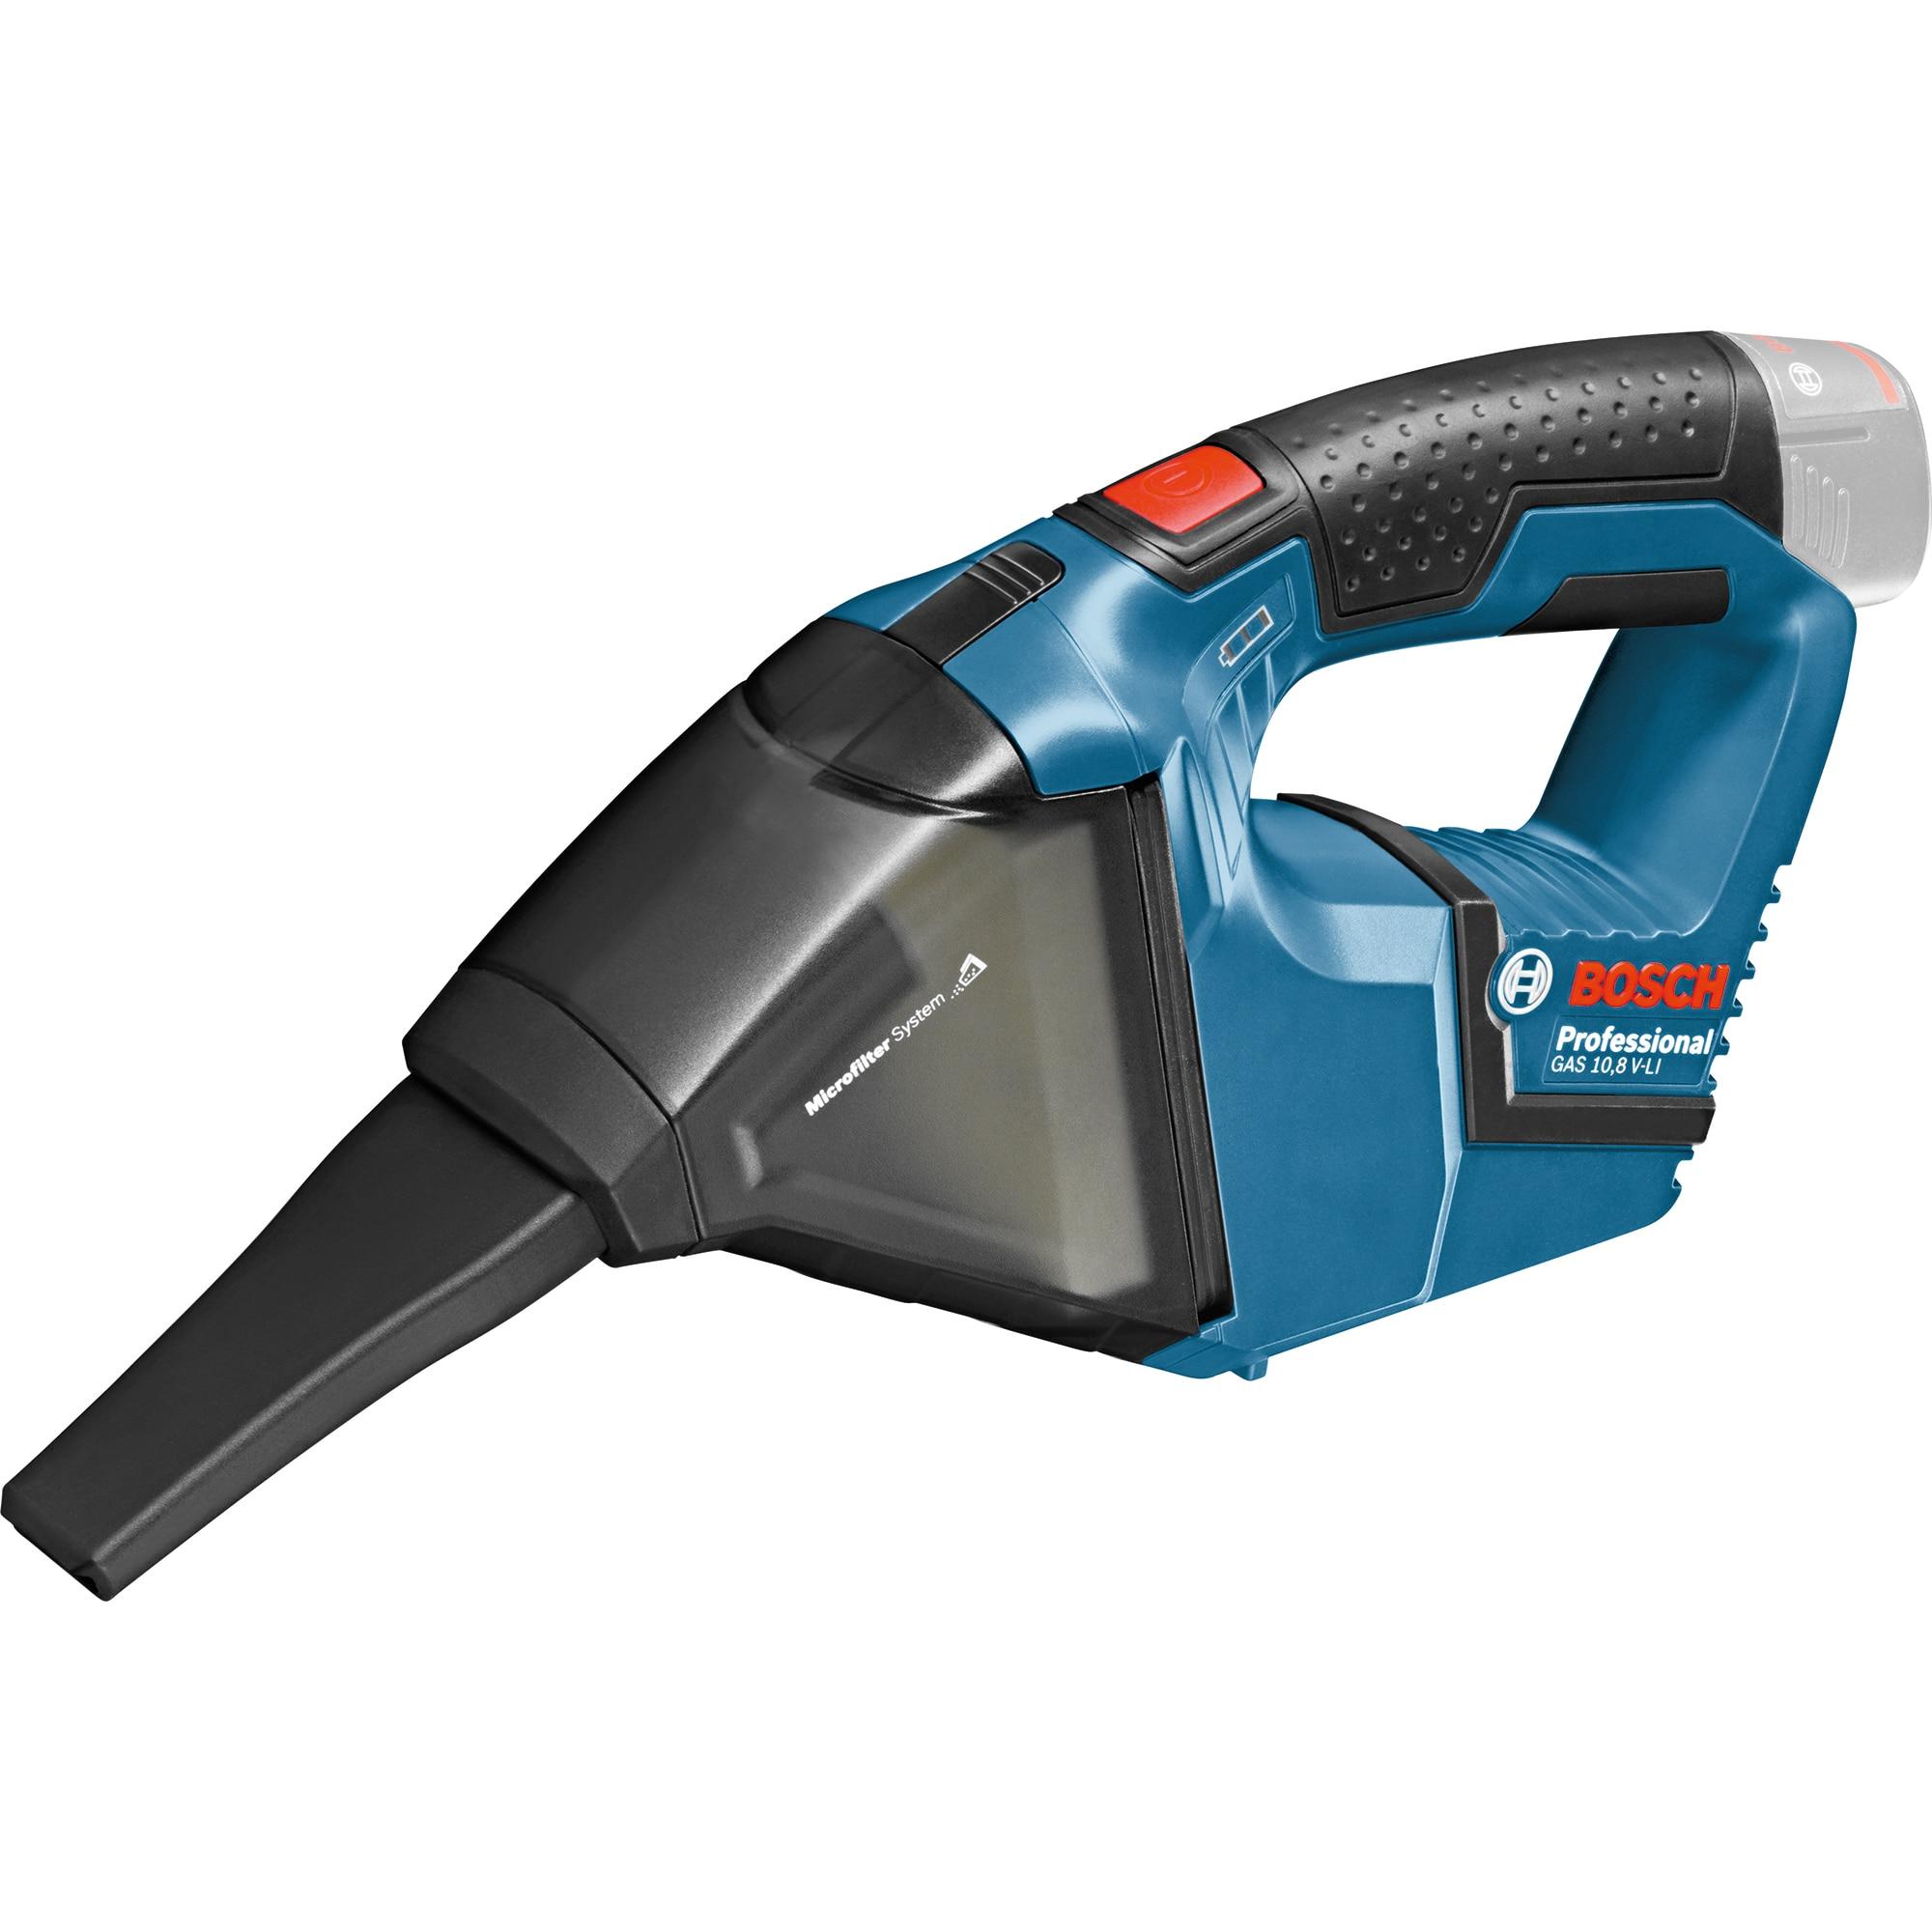 Fotografie Aspirator pe acumulator Bosch Professional GAS 12V, 12 V, 15 l/sec flux aer, 45 mbar, 408 cm² suprafata filtrare, 0.35 l volum rezervor, fara acumulator/incarcator